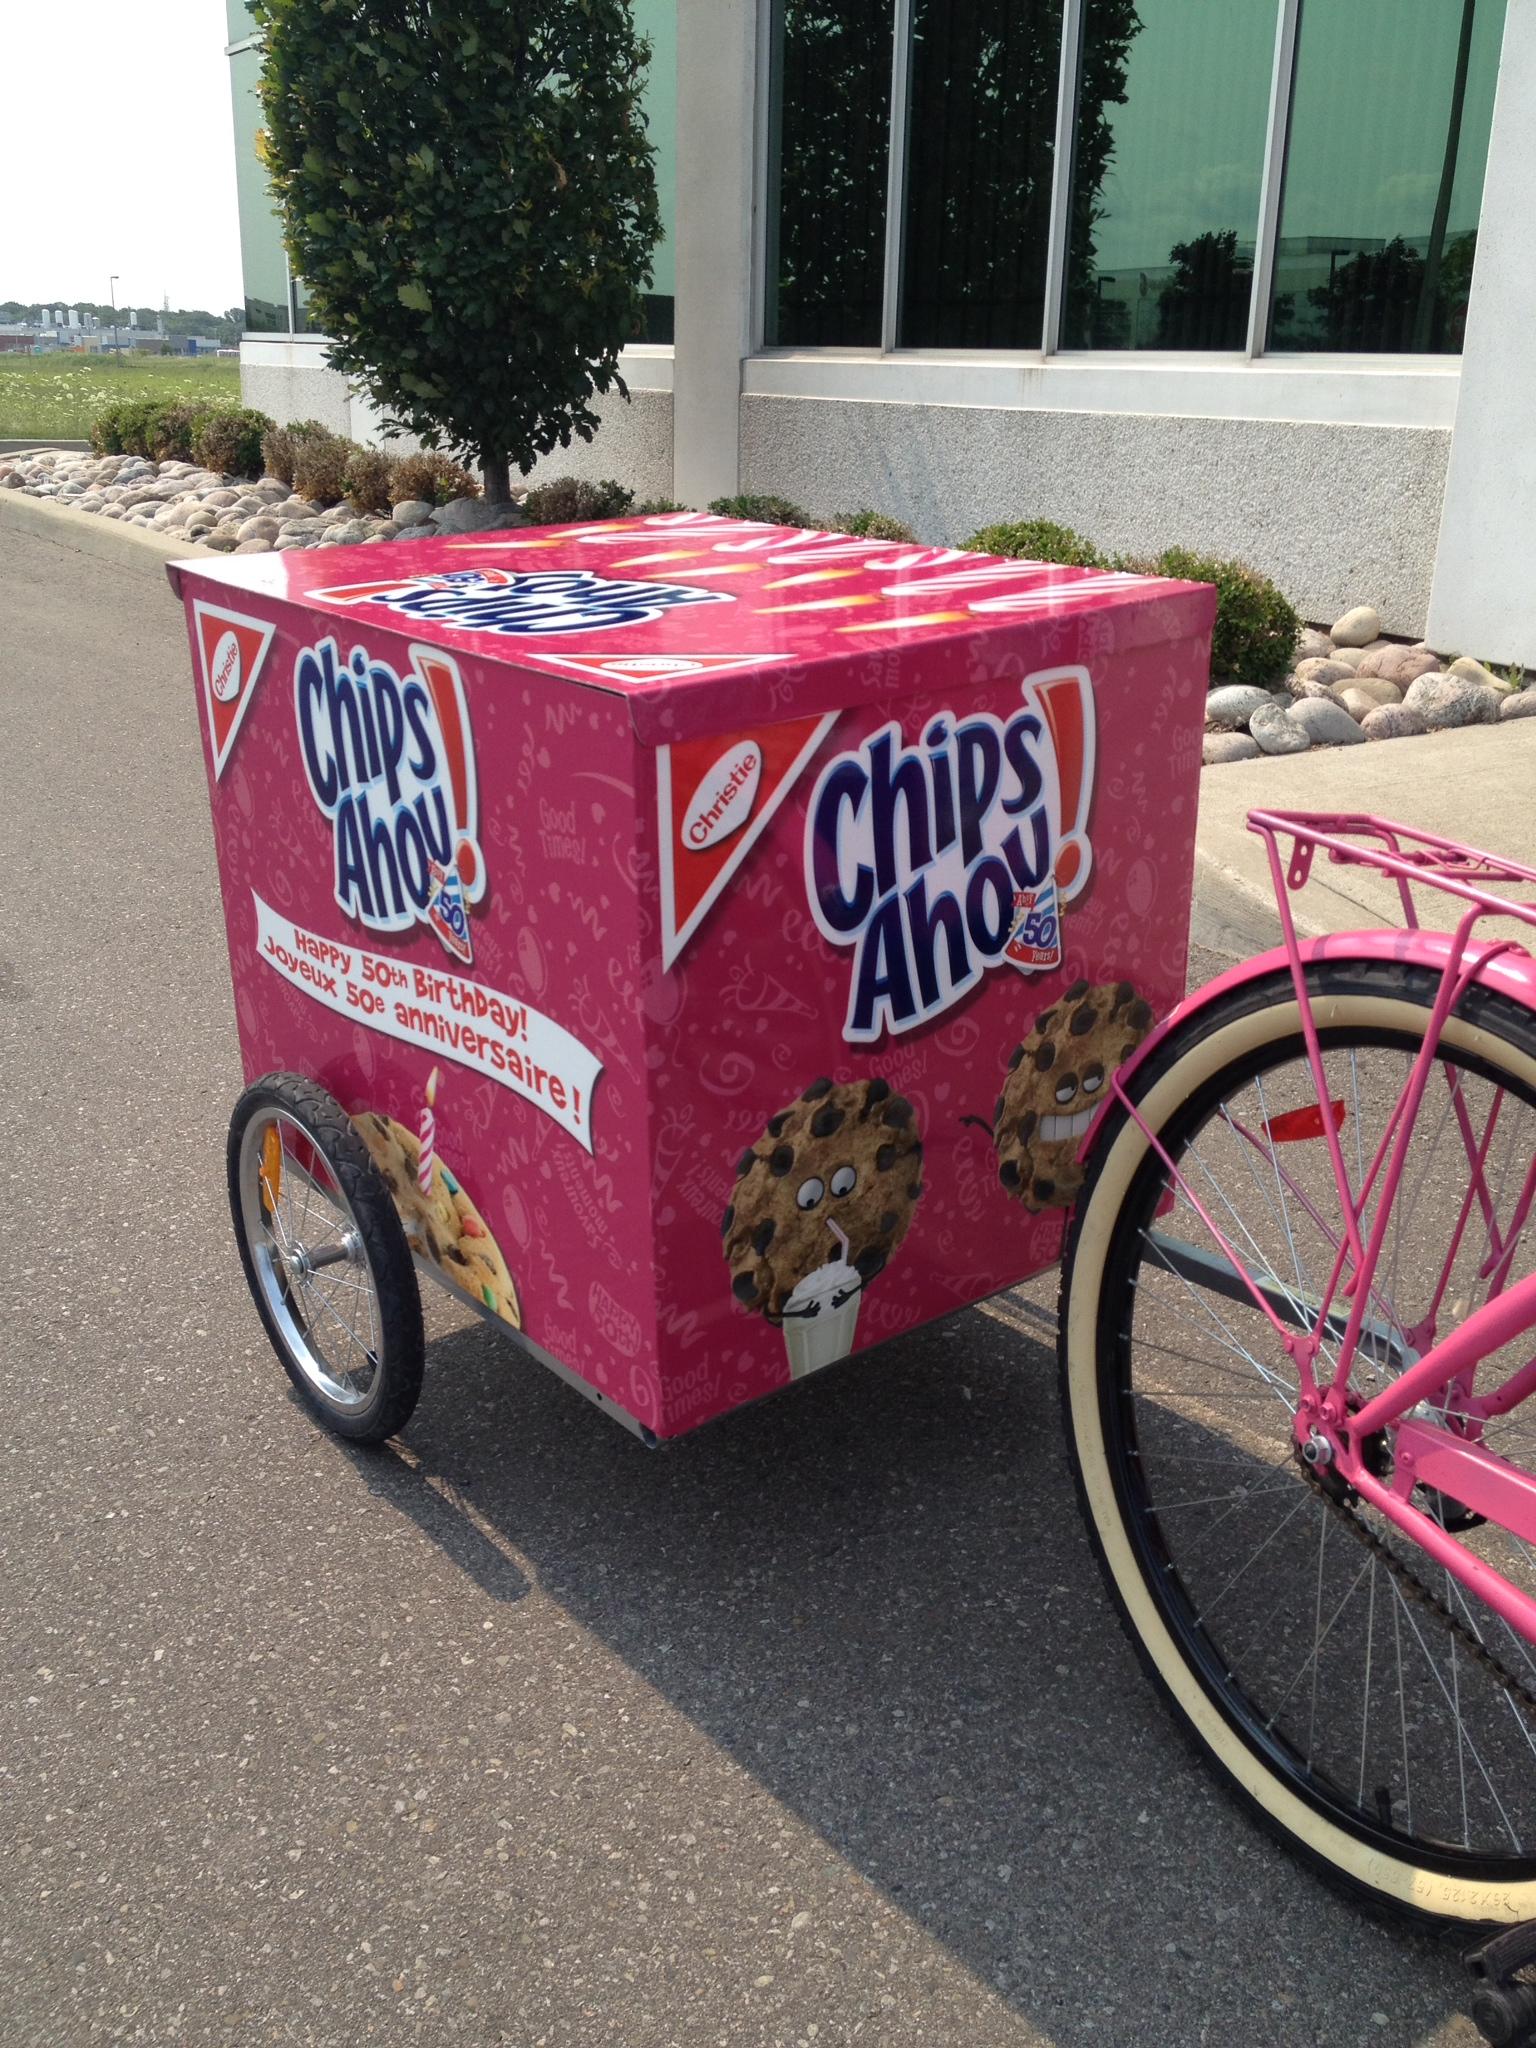 Chips Ahoy bike trailer wrap